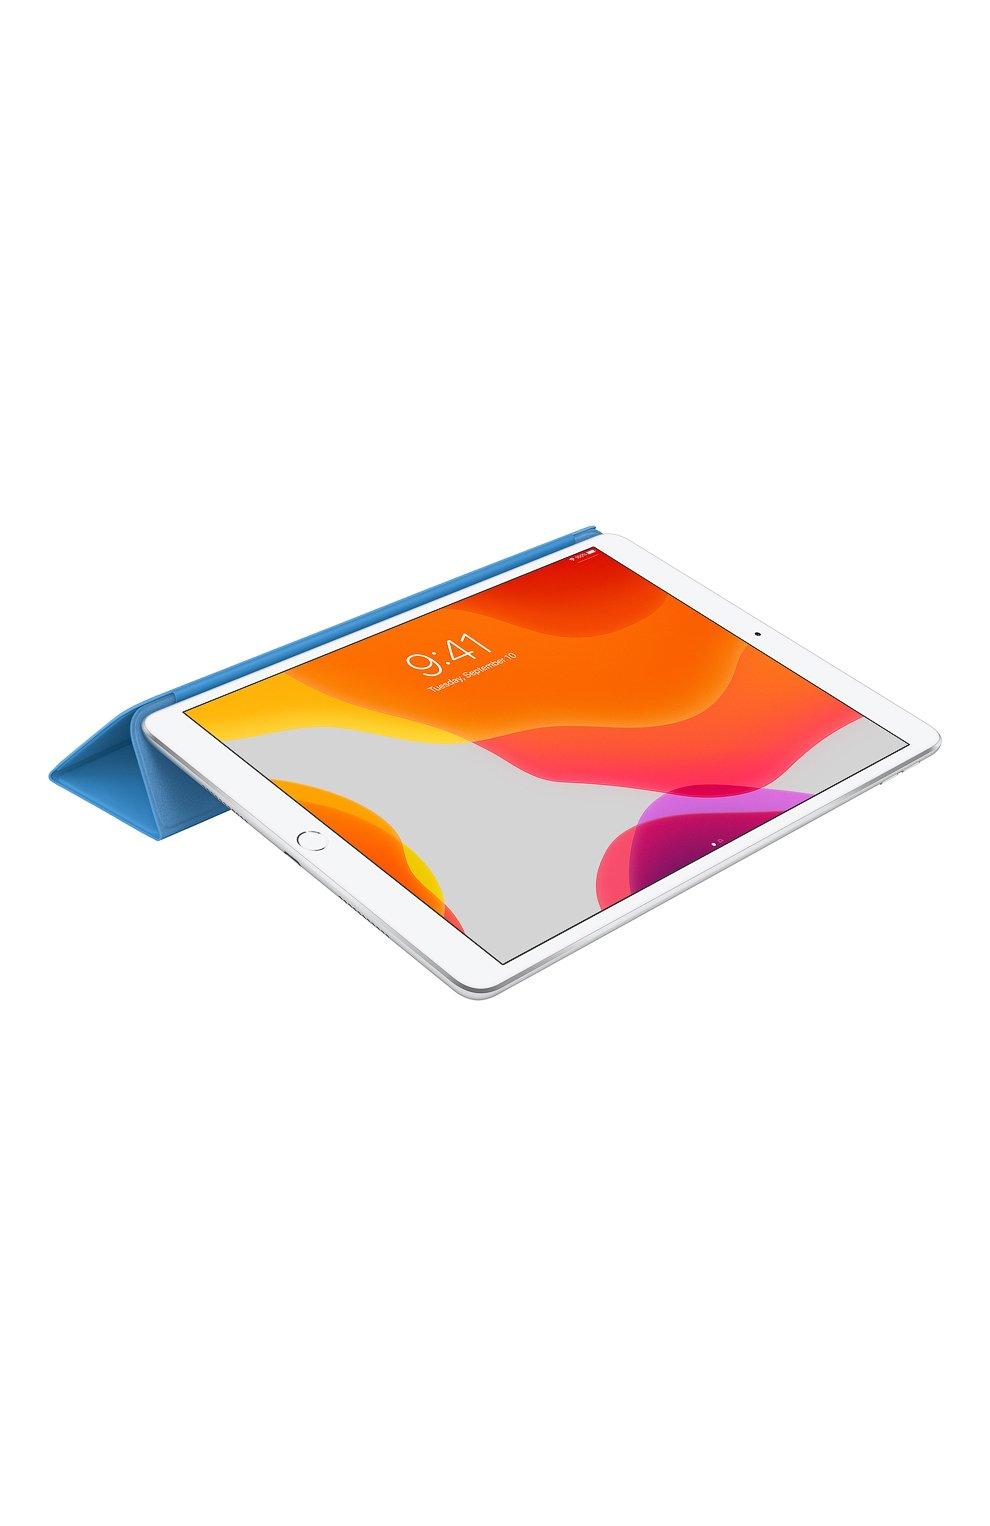 Мужской чехол smart cover для ipad (7th gen)/ipad air (3rd gen) APPLE  синего цвета, арт. MXTF2ZM/A   Фото 4